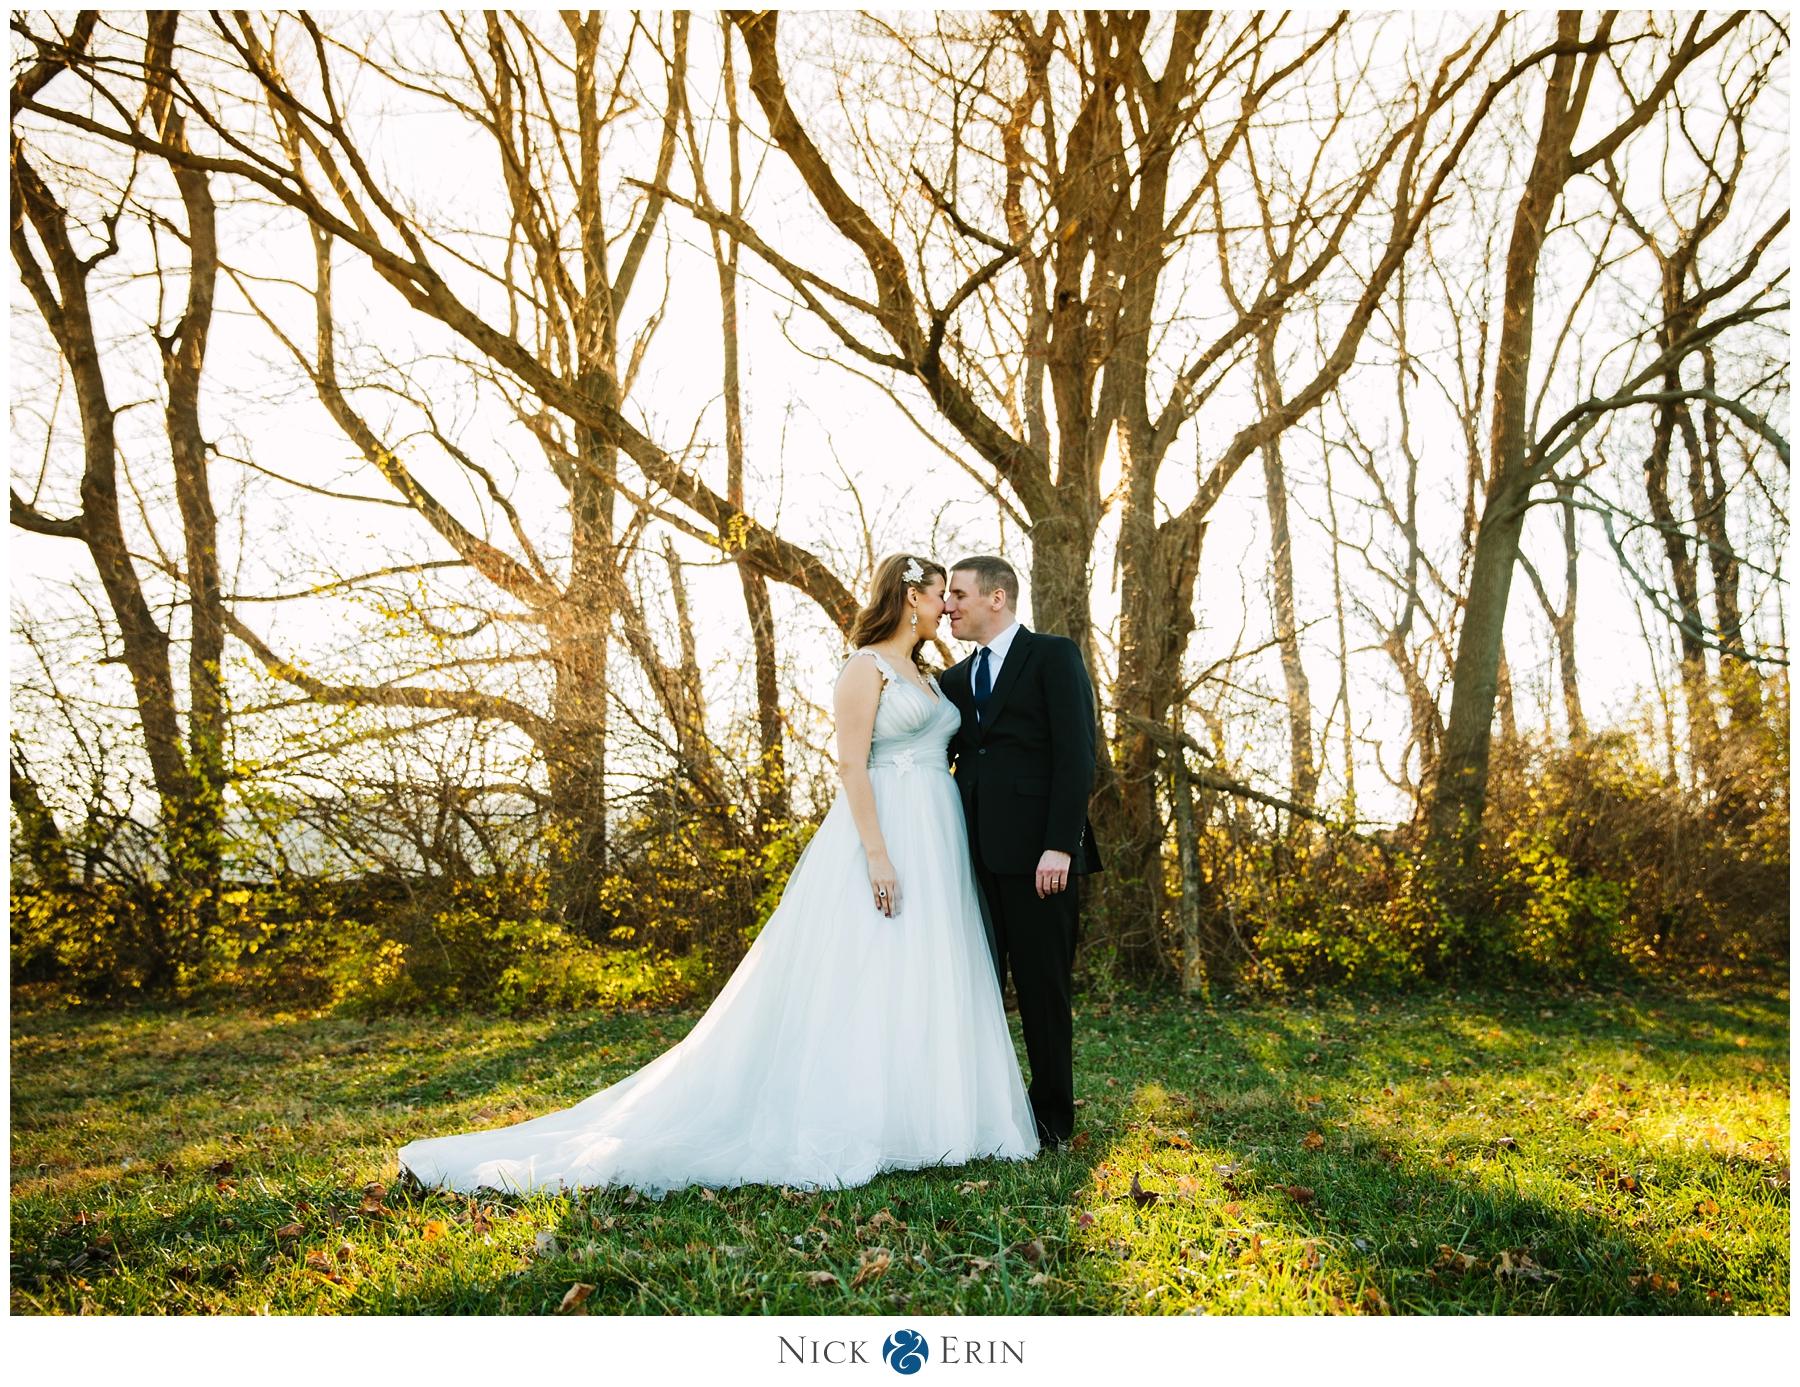 Donner_Photography_Mendenhall Inn Wedding_Blake & Kristina_0009